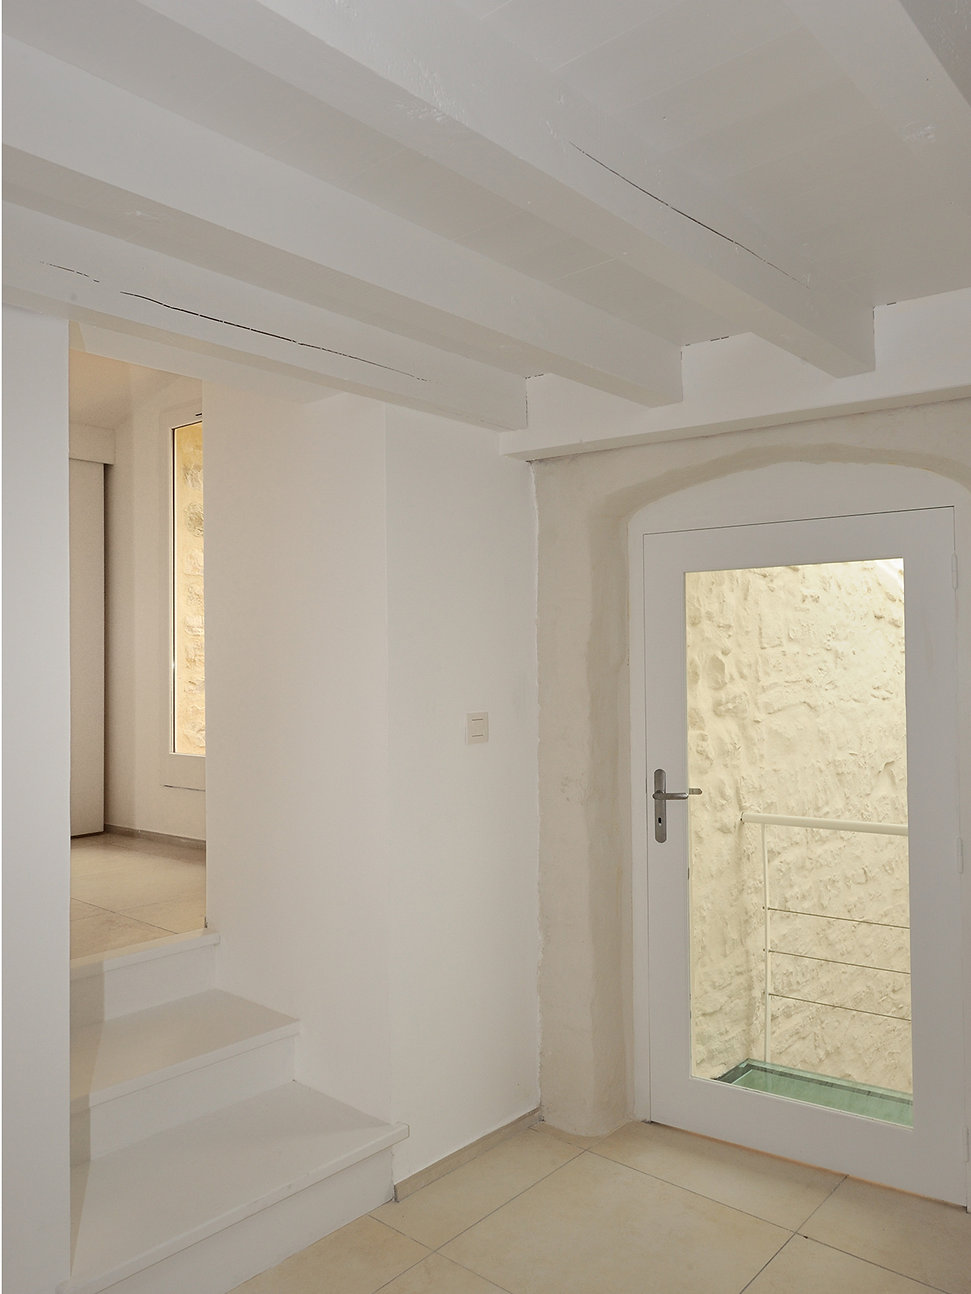 05_Maison Blanche-Martin Henck.jpg